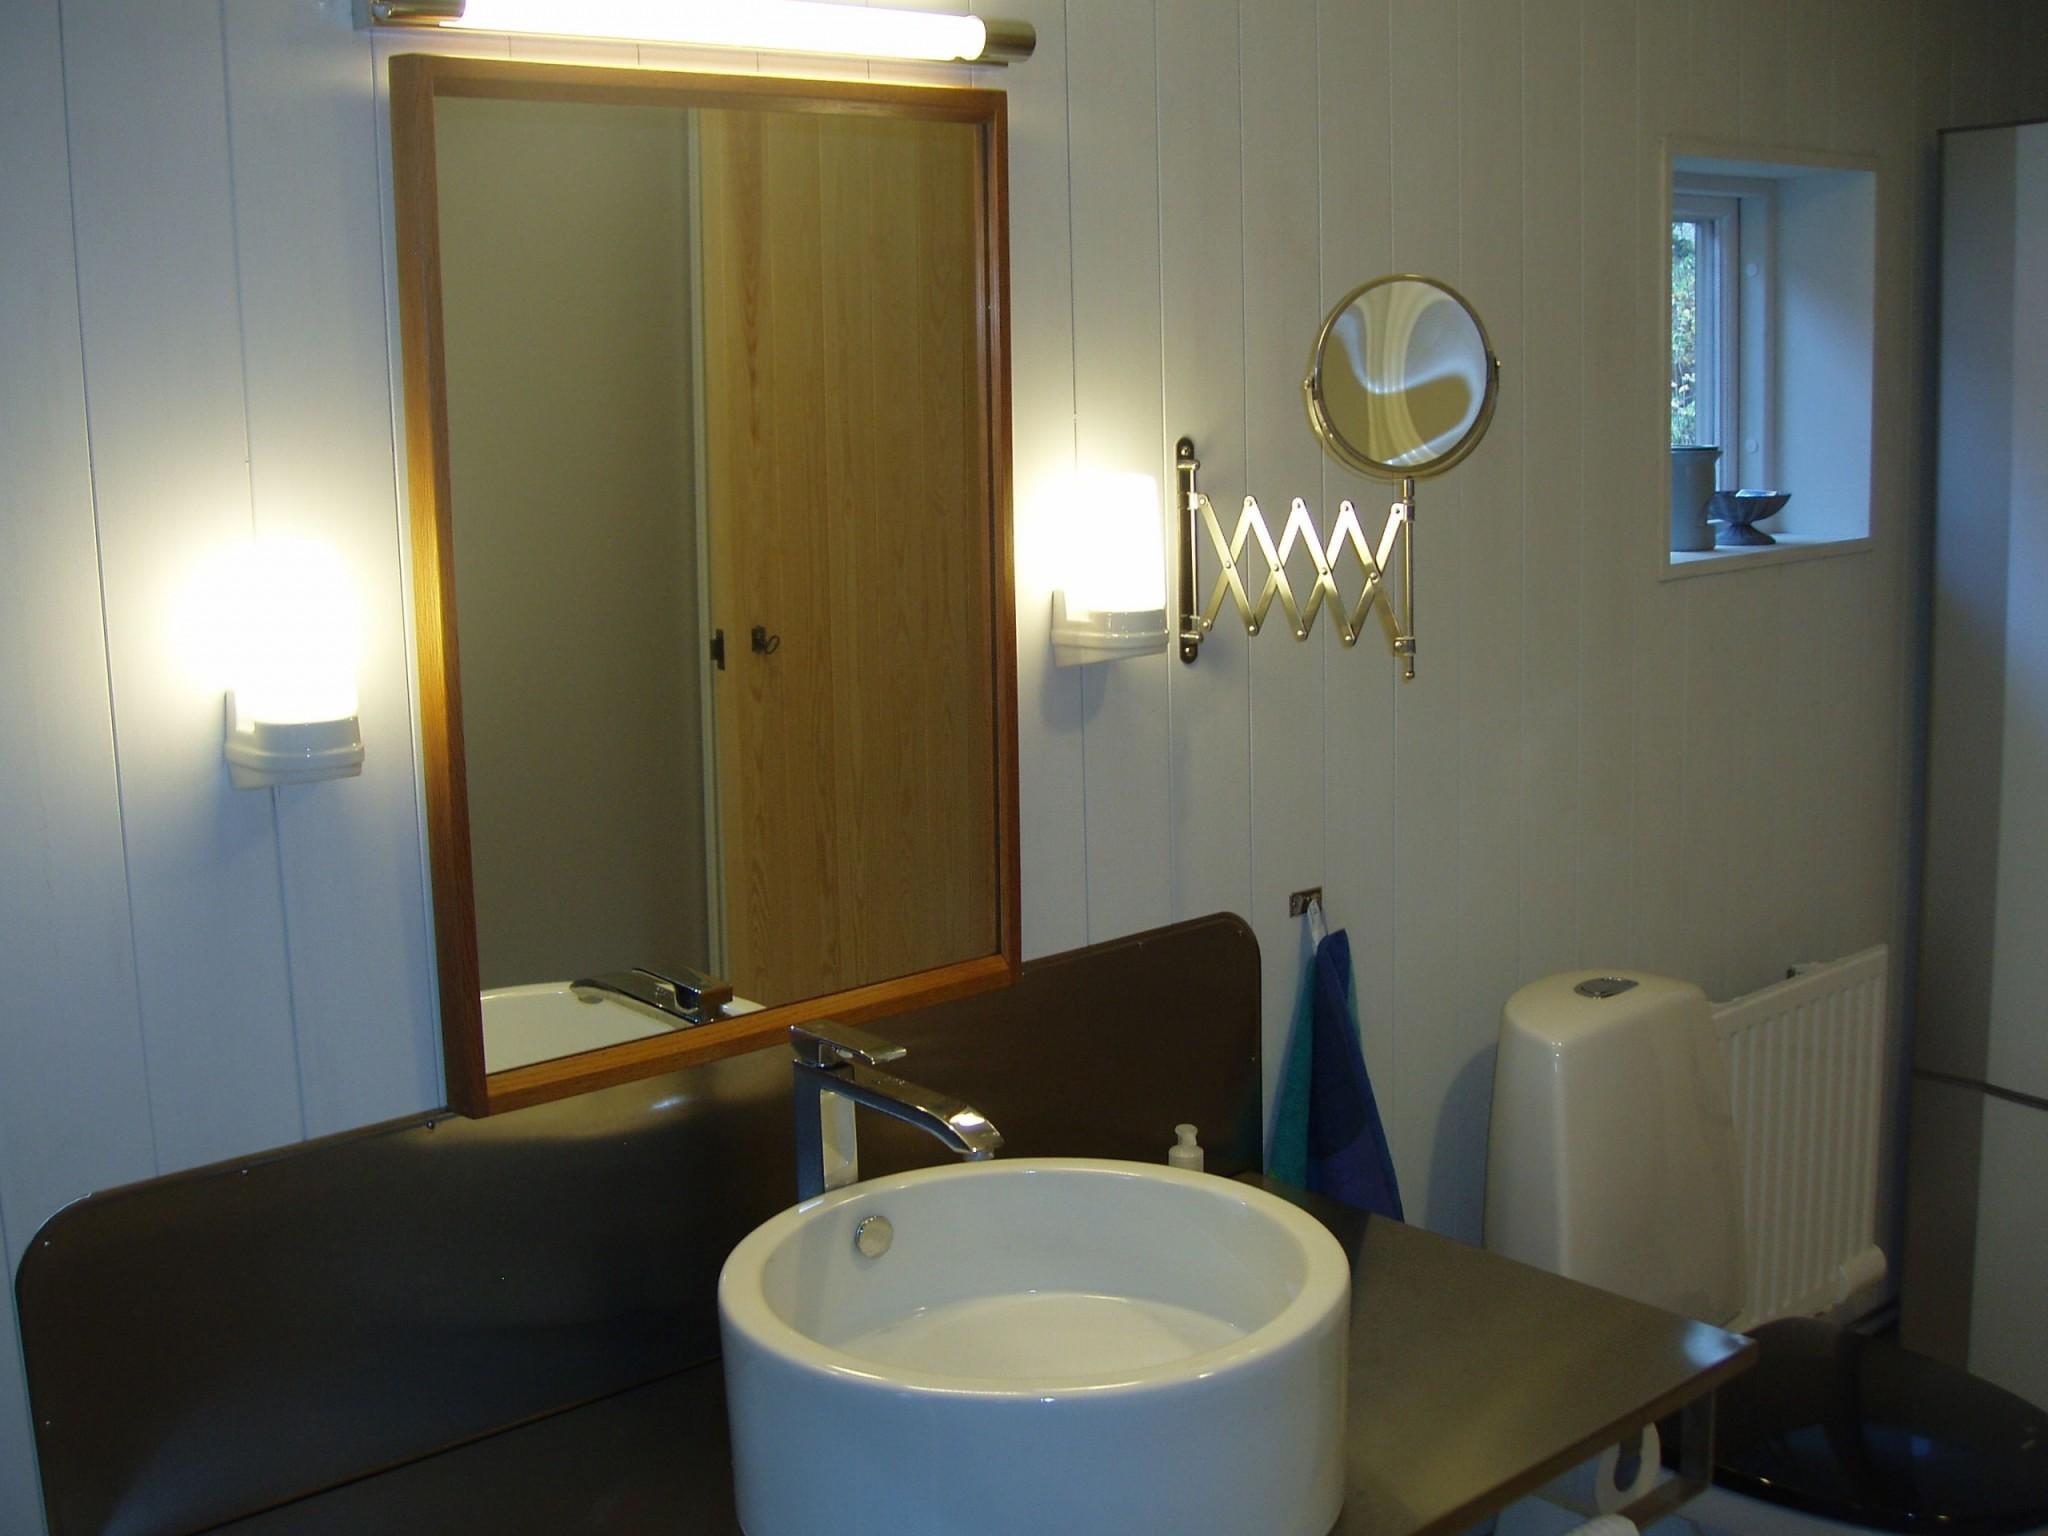 Modernt badrum i gammal stil